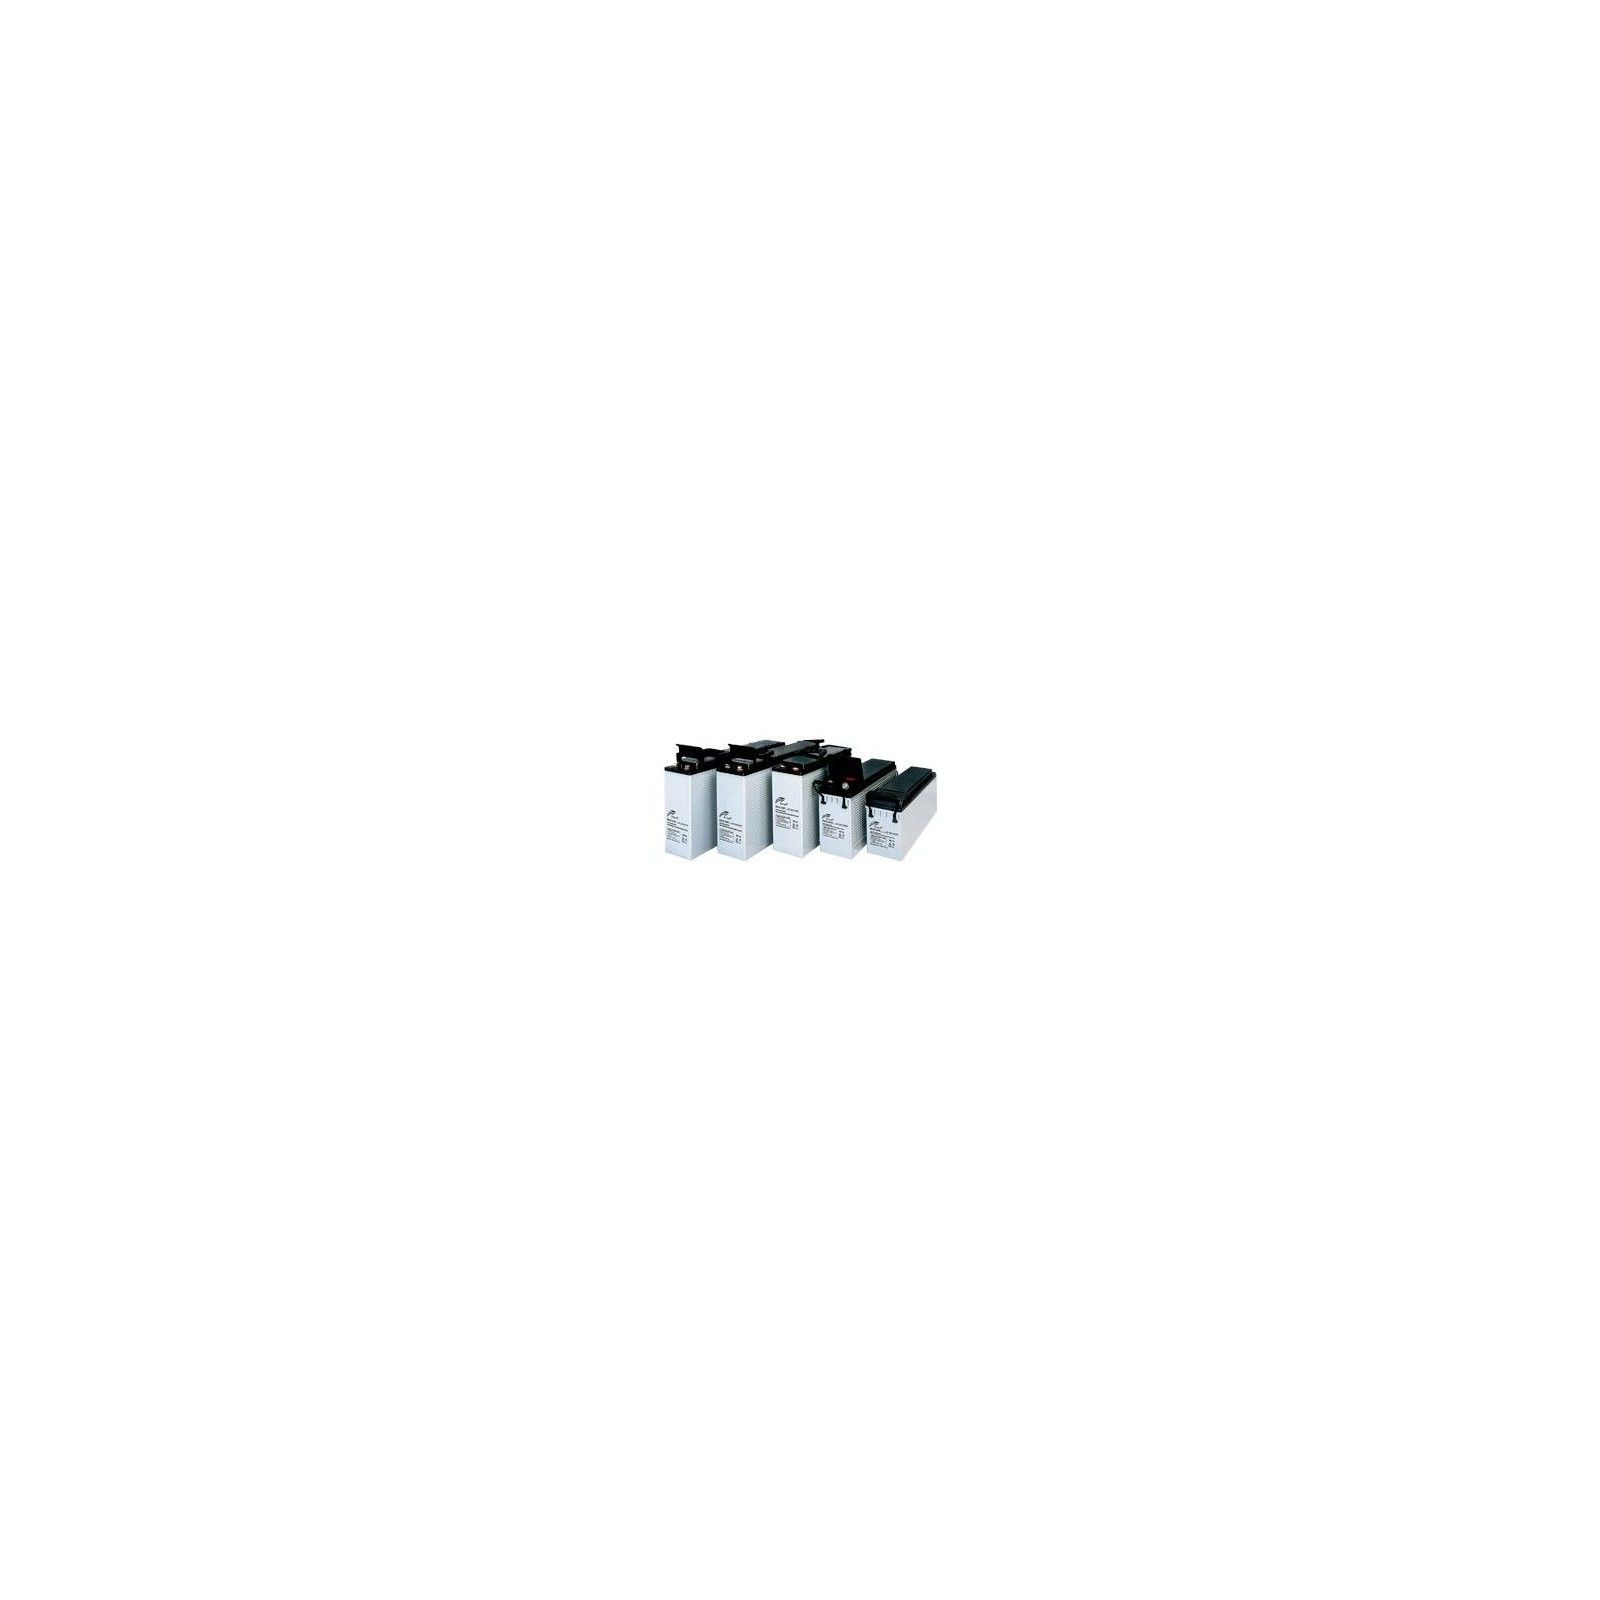 Batería Ritar HR12-150W 40Ah 12V Hr RITAR - 1